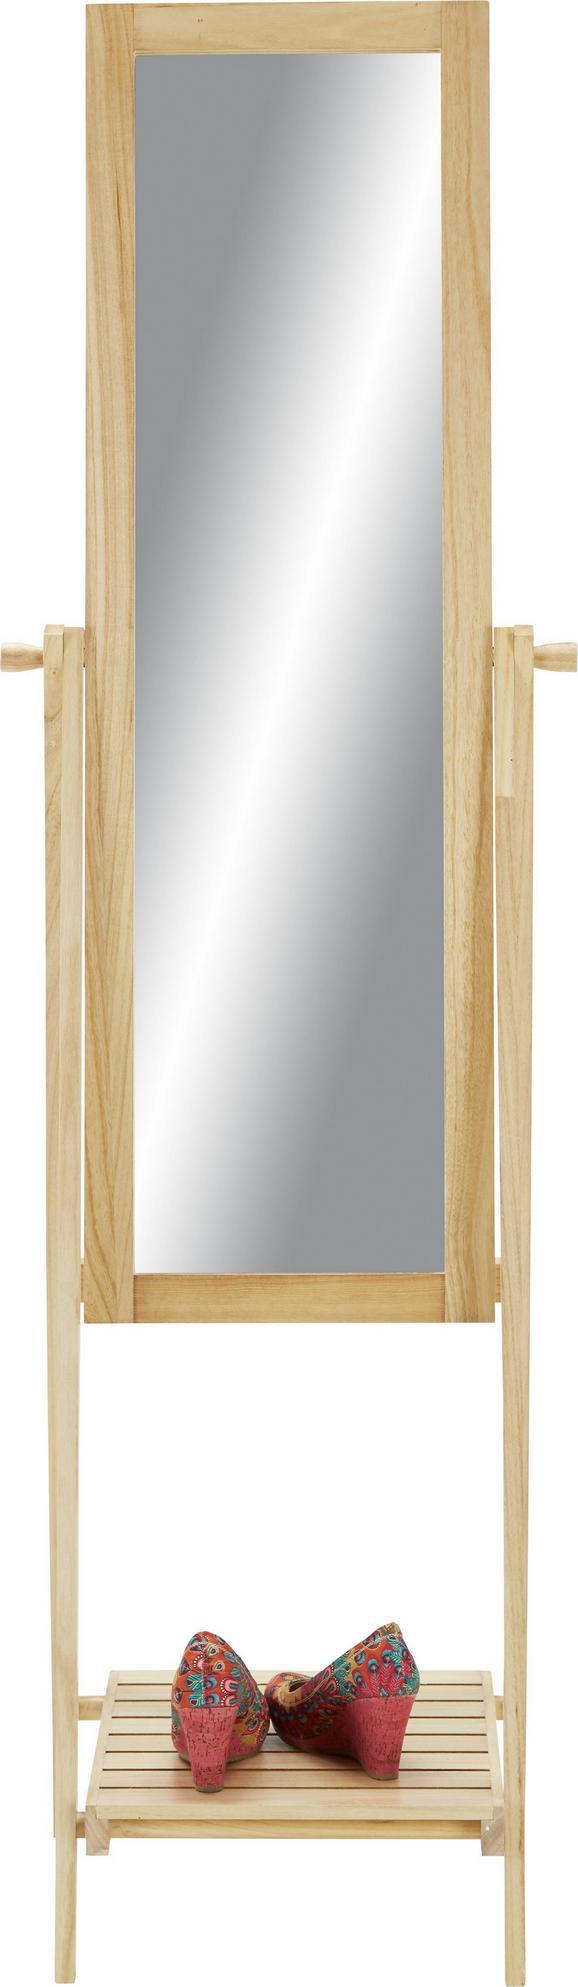 Standspiegel Naturfarben - Naturfarben, MODERN, Glas/Holz (52/174/48cm) - Mömax modern living